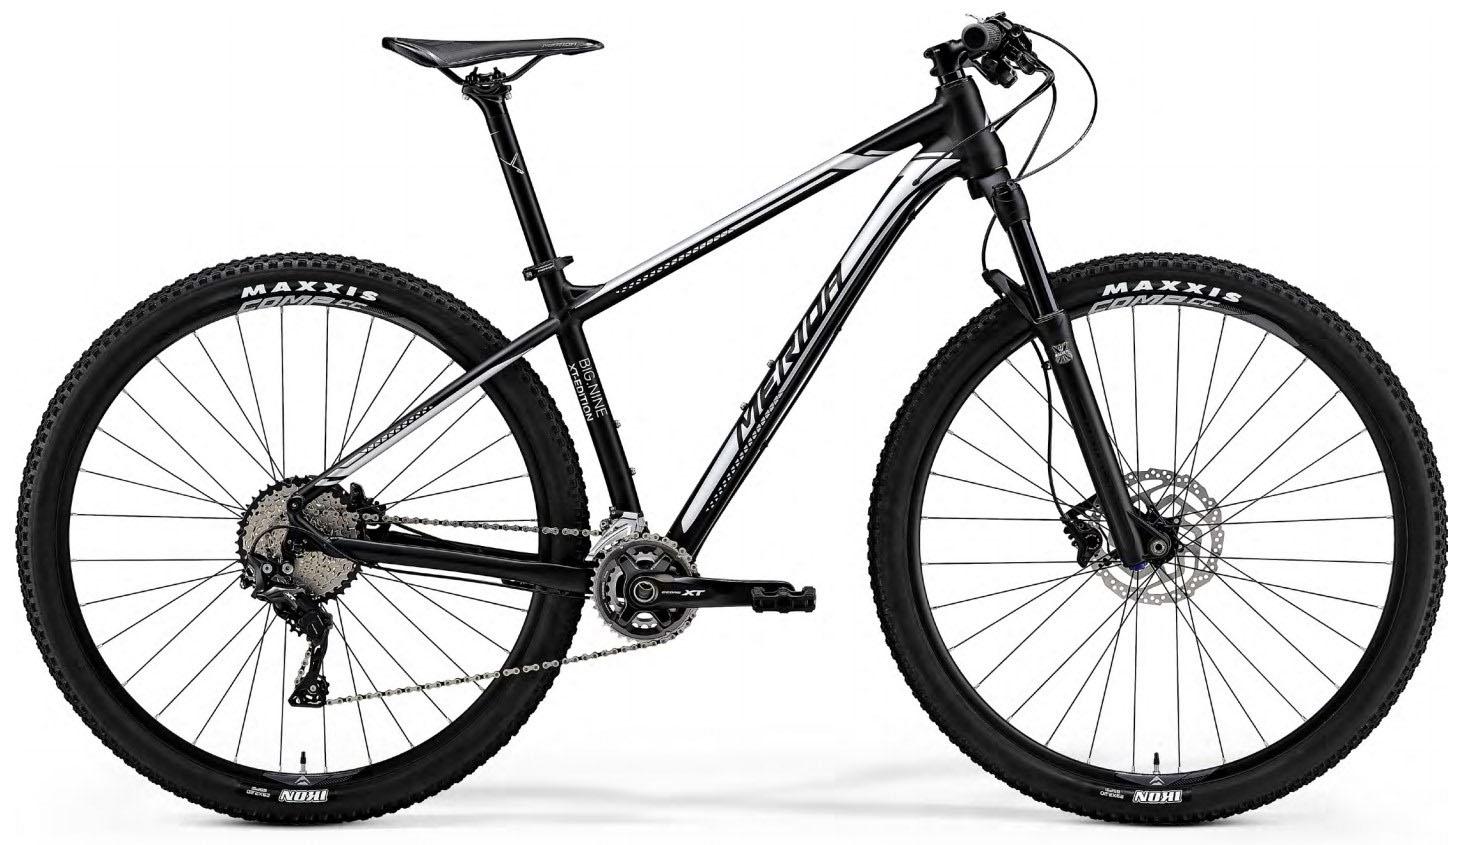 Велосипед Merida Big.Seven XT Edition 2019 велосипед merida big ninety nine pro xo edition 2013